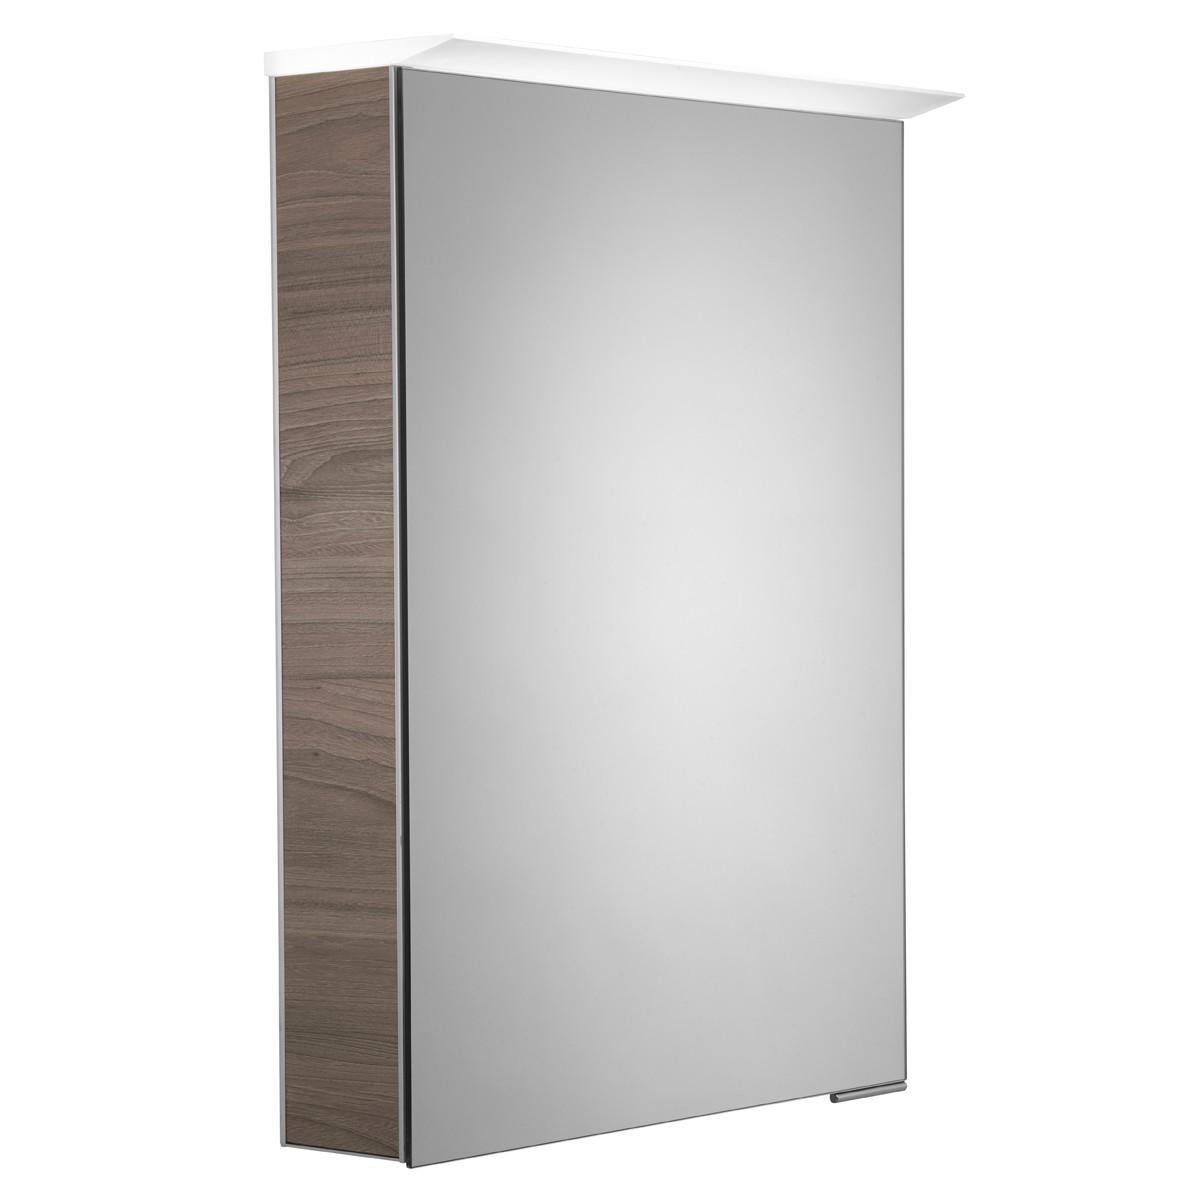 Roper rhodes virtue led illuminated bathroom cabinet in for Bathroom cabinets led